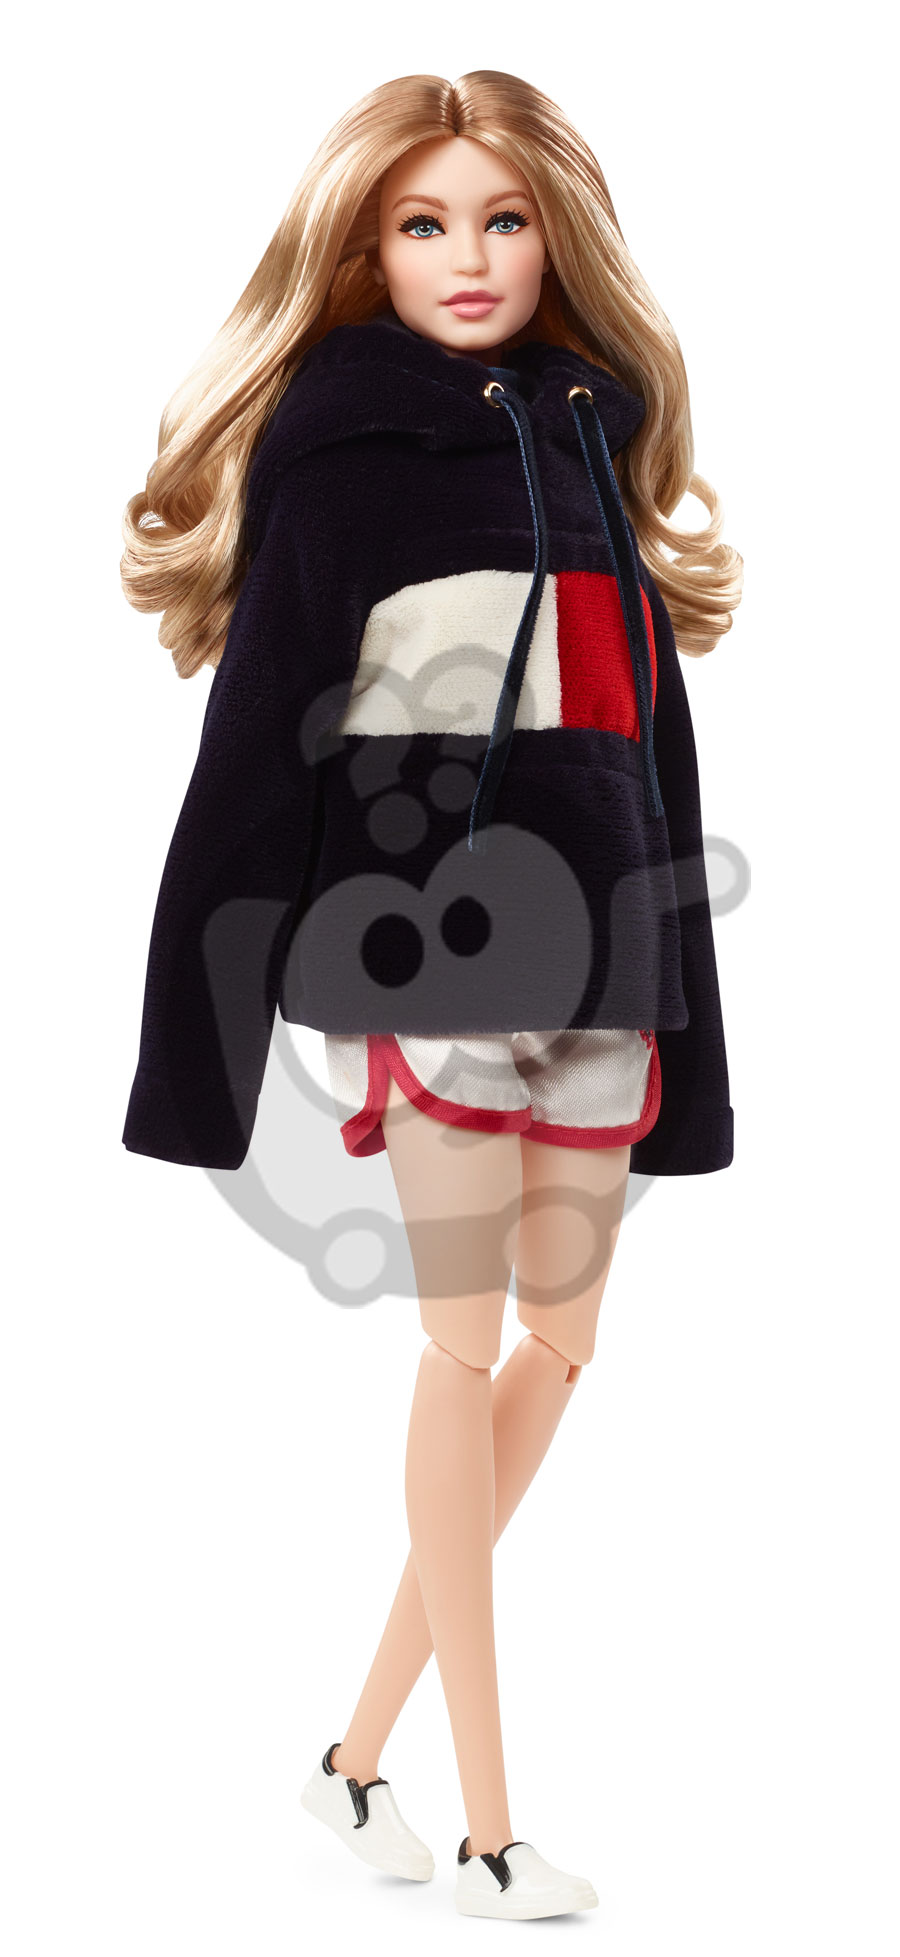 GIGI HADID Barbie lutka u saradnji sa brendom TOMMY HILFIGER